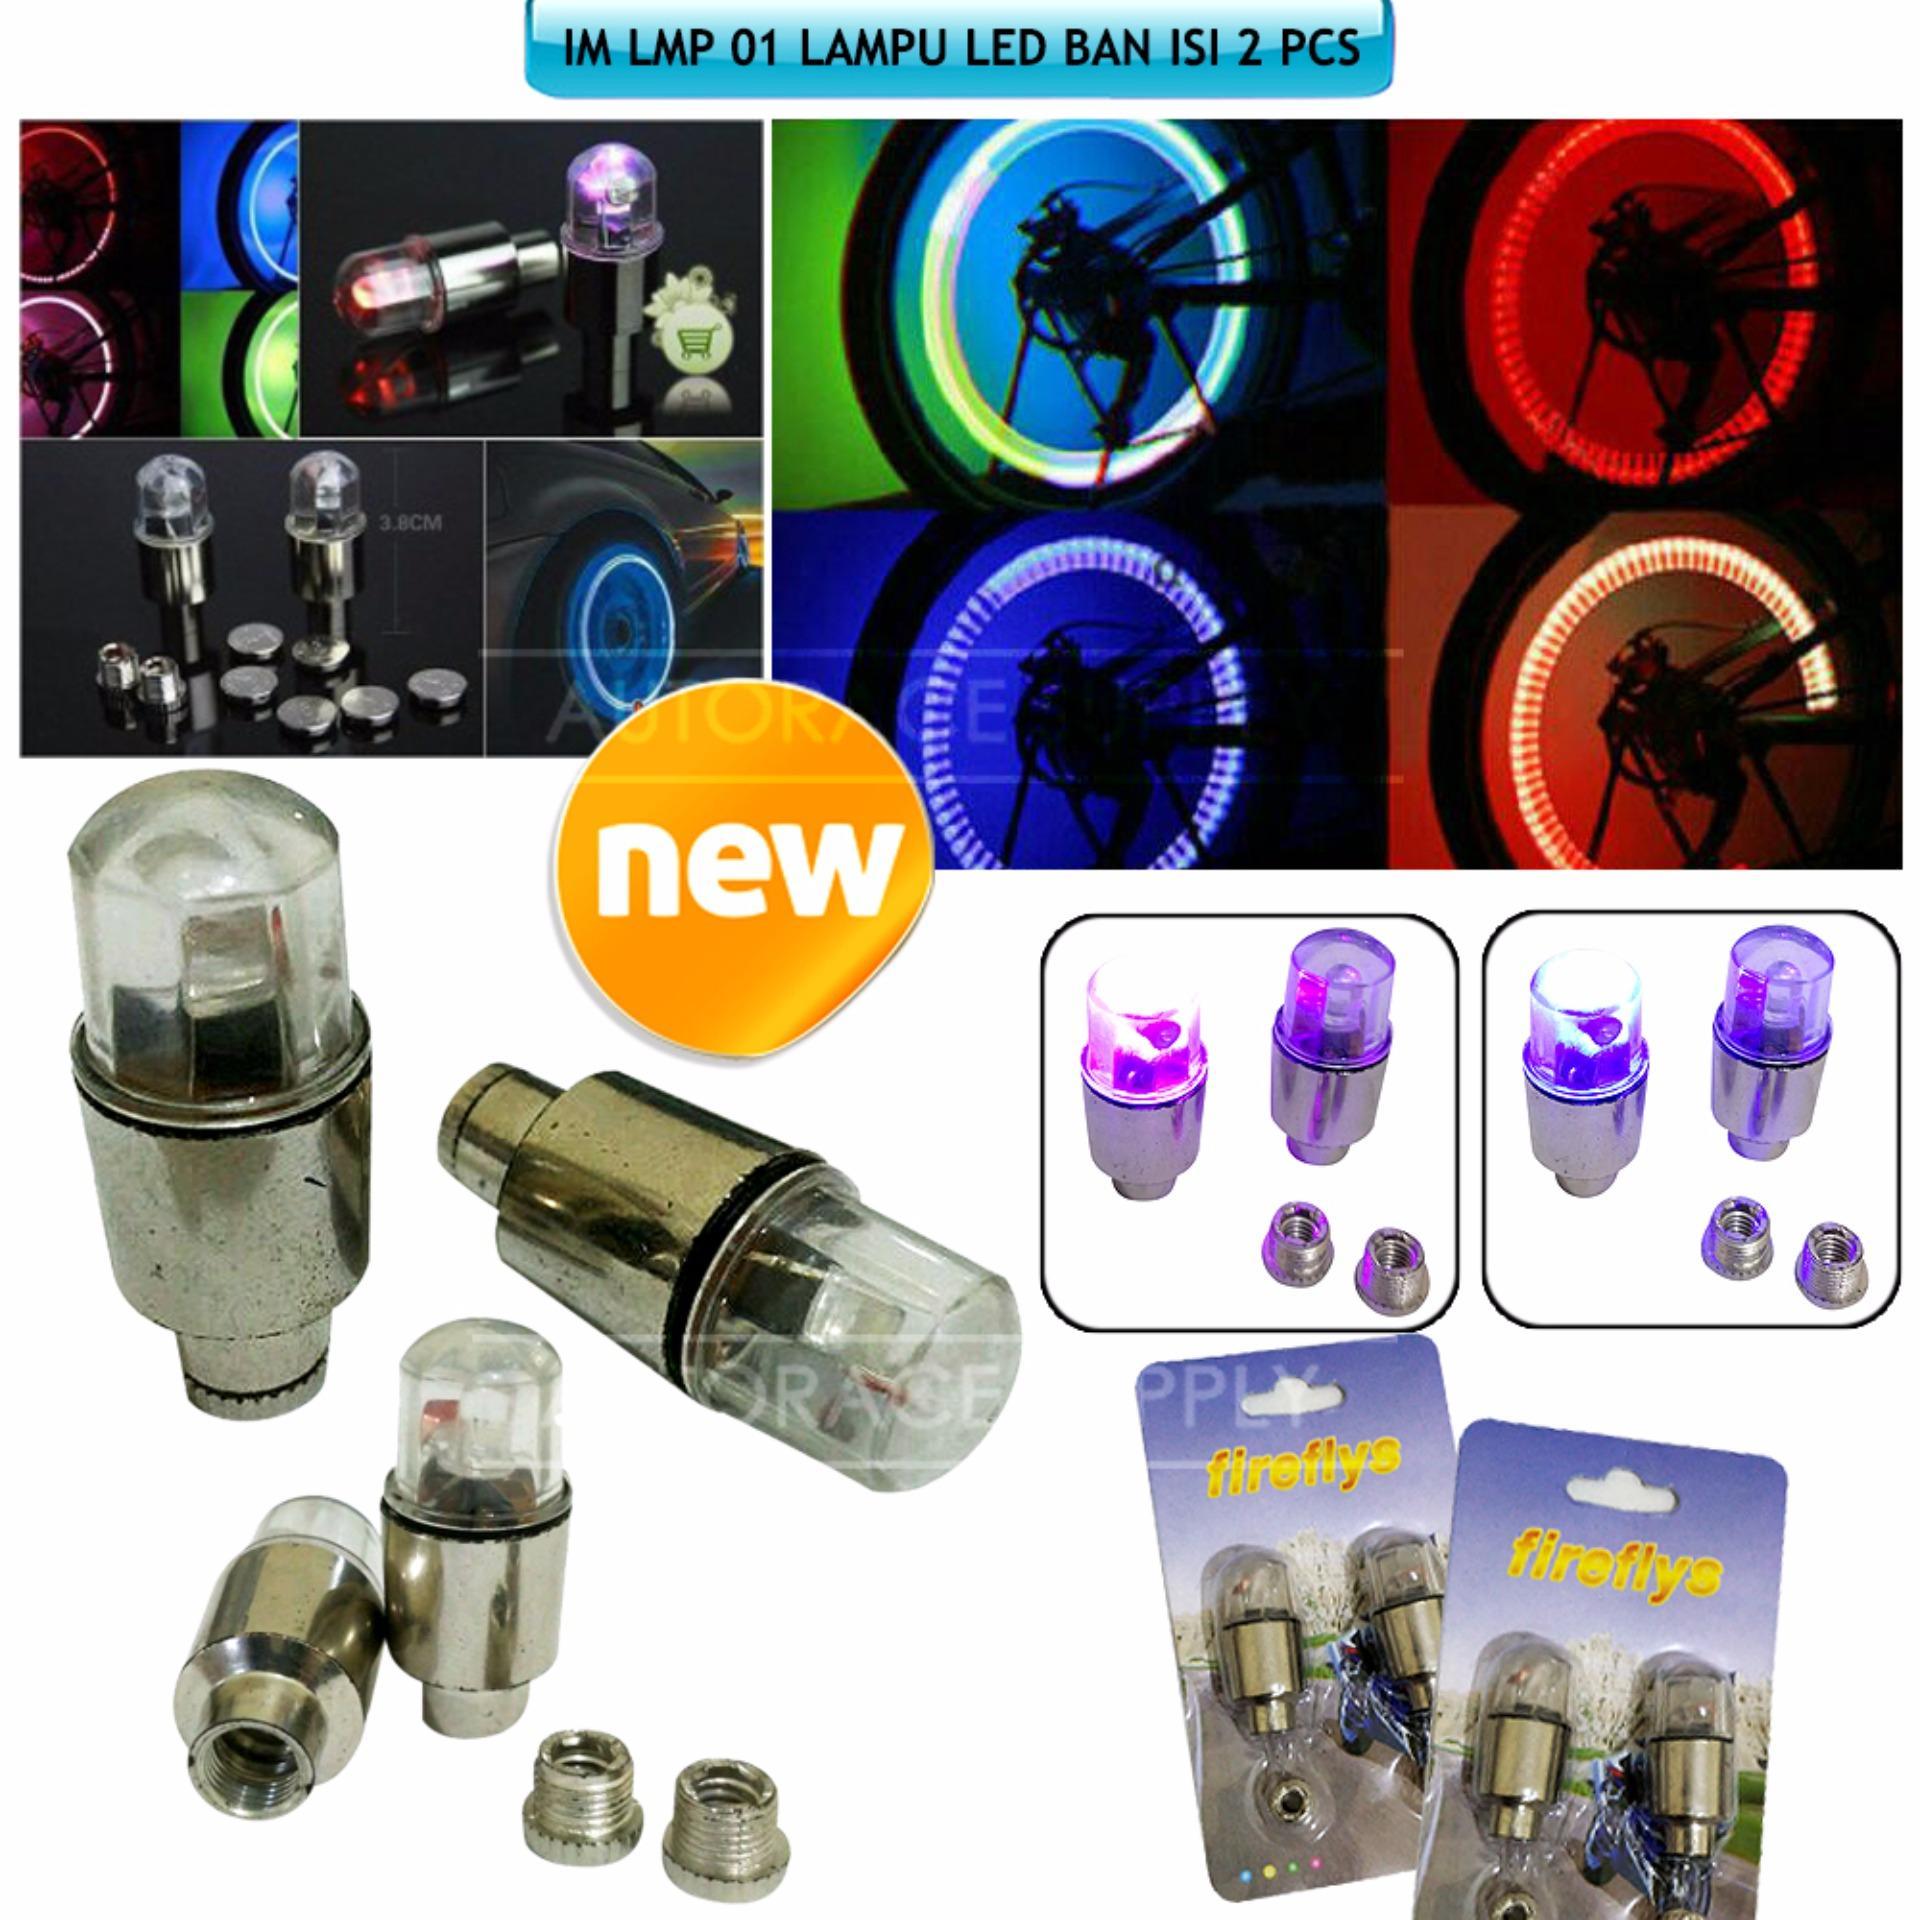 2 pcs Lampu LED Ban / Lampu Dekorasi velg LMP-01 - Rainbow